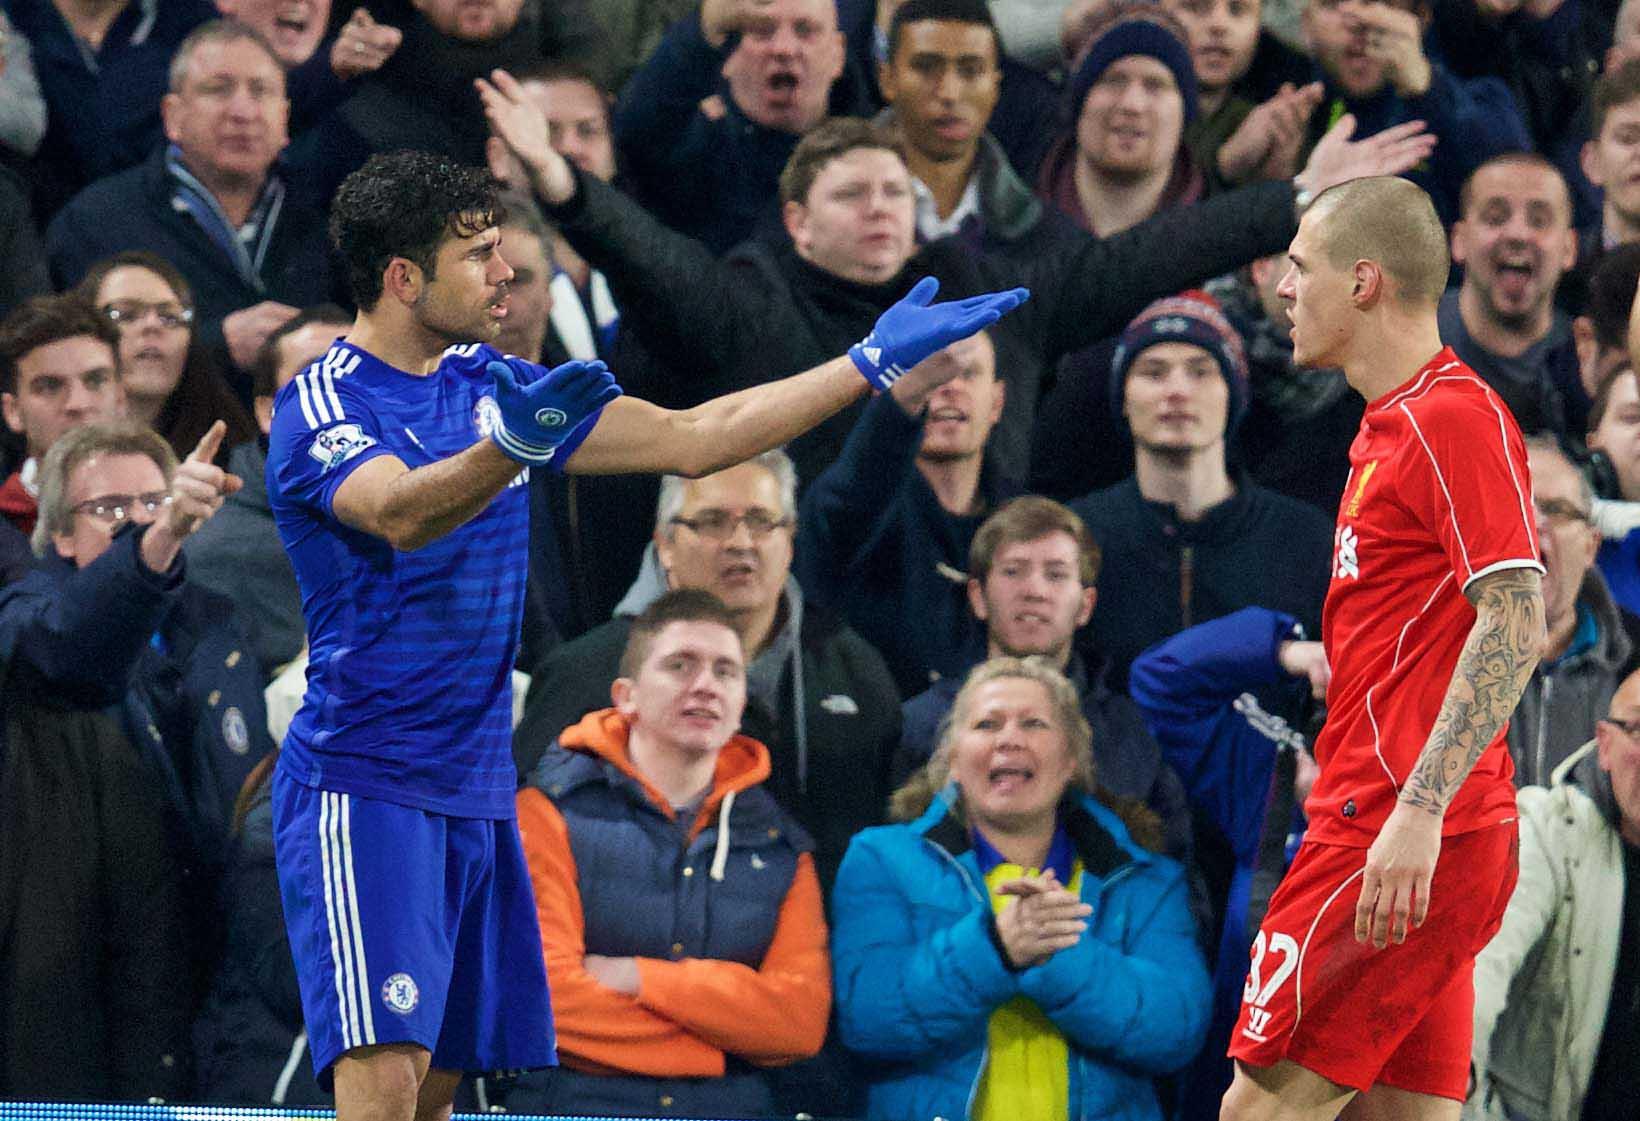 Football - Football League Cup - Semi-Final 2nd Leg - Chelsea FC v Liverpool FC